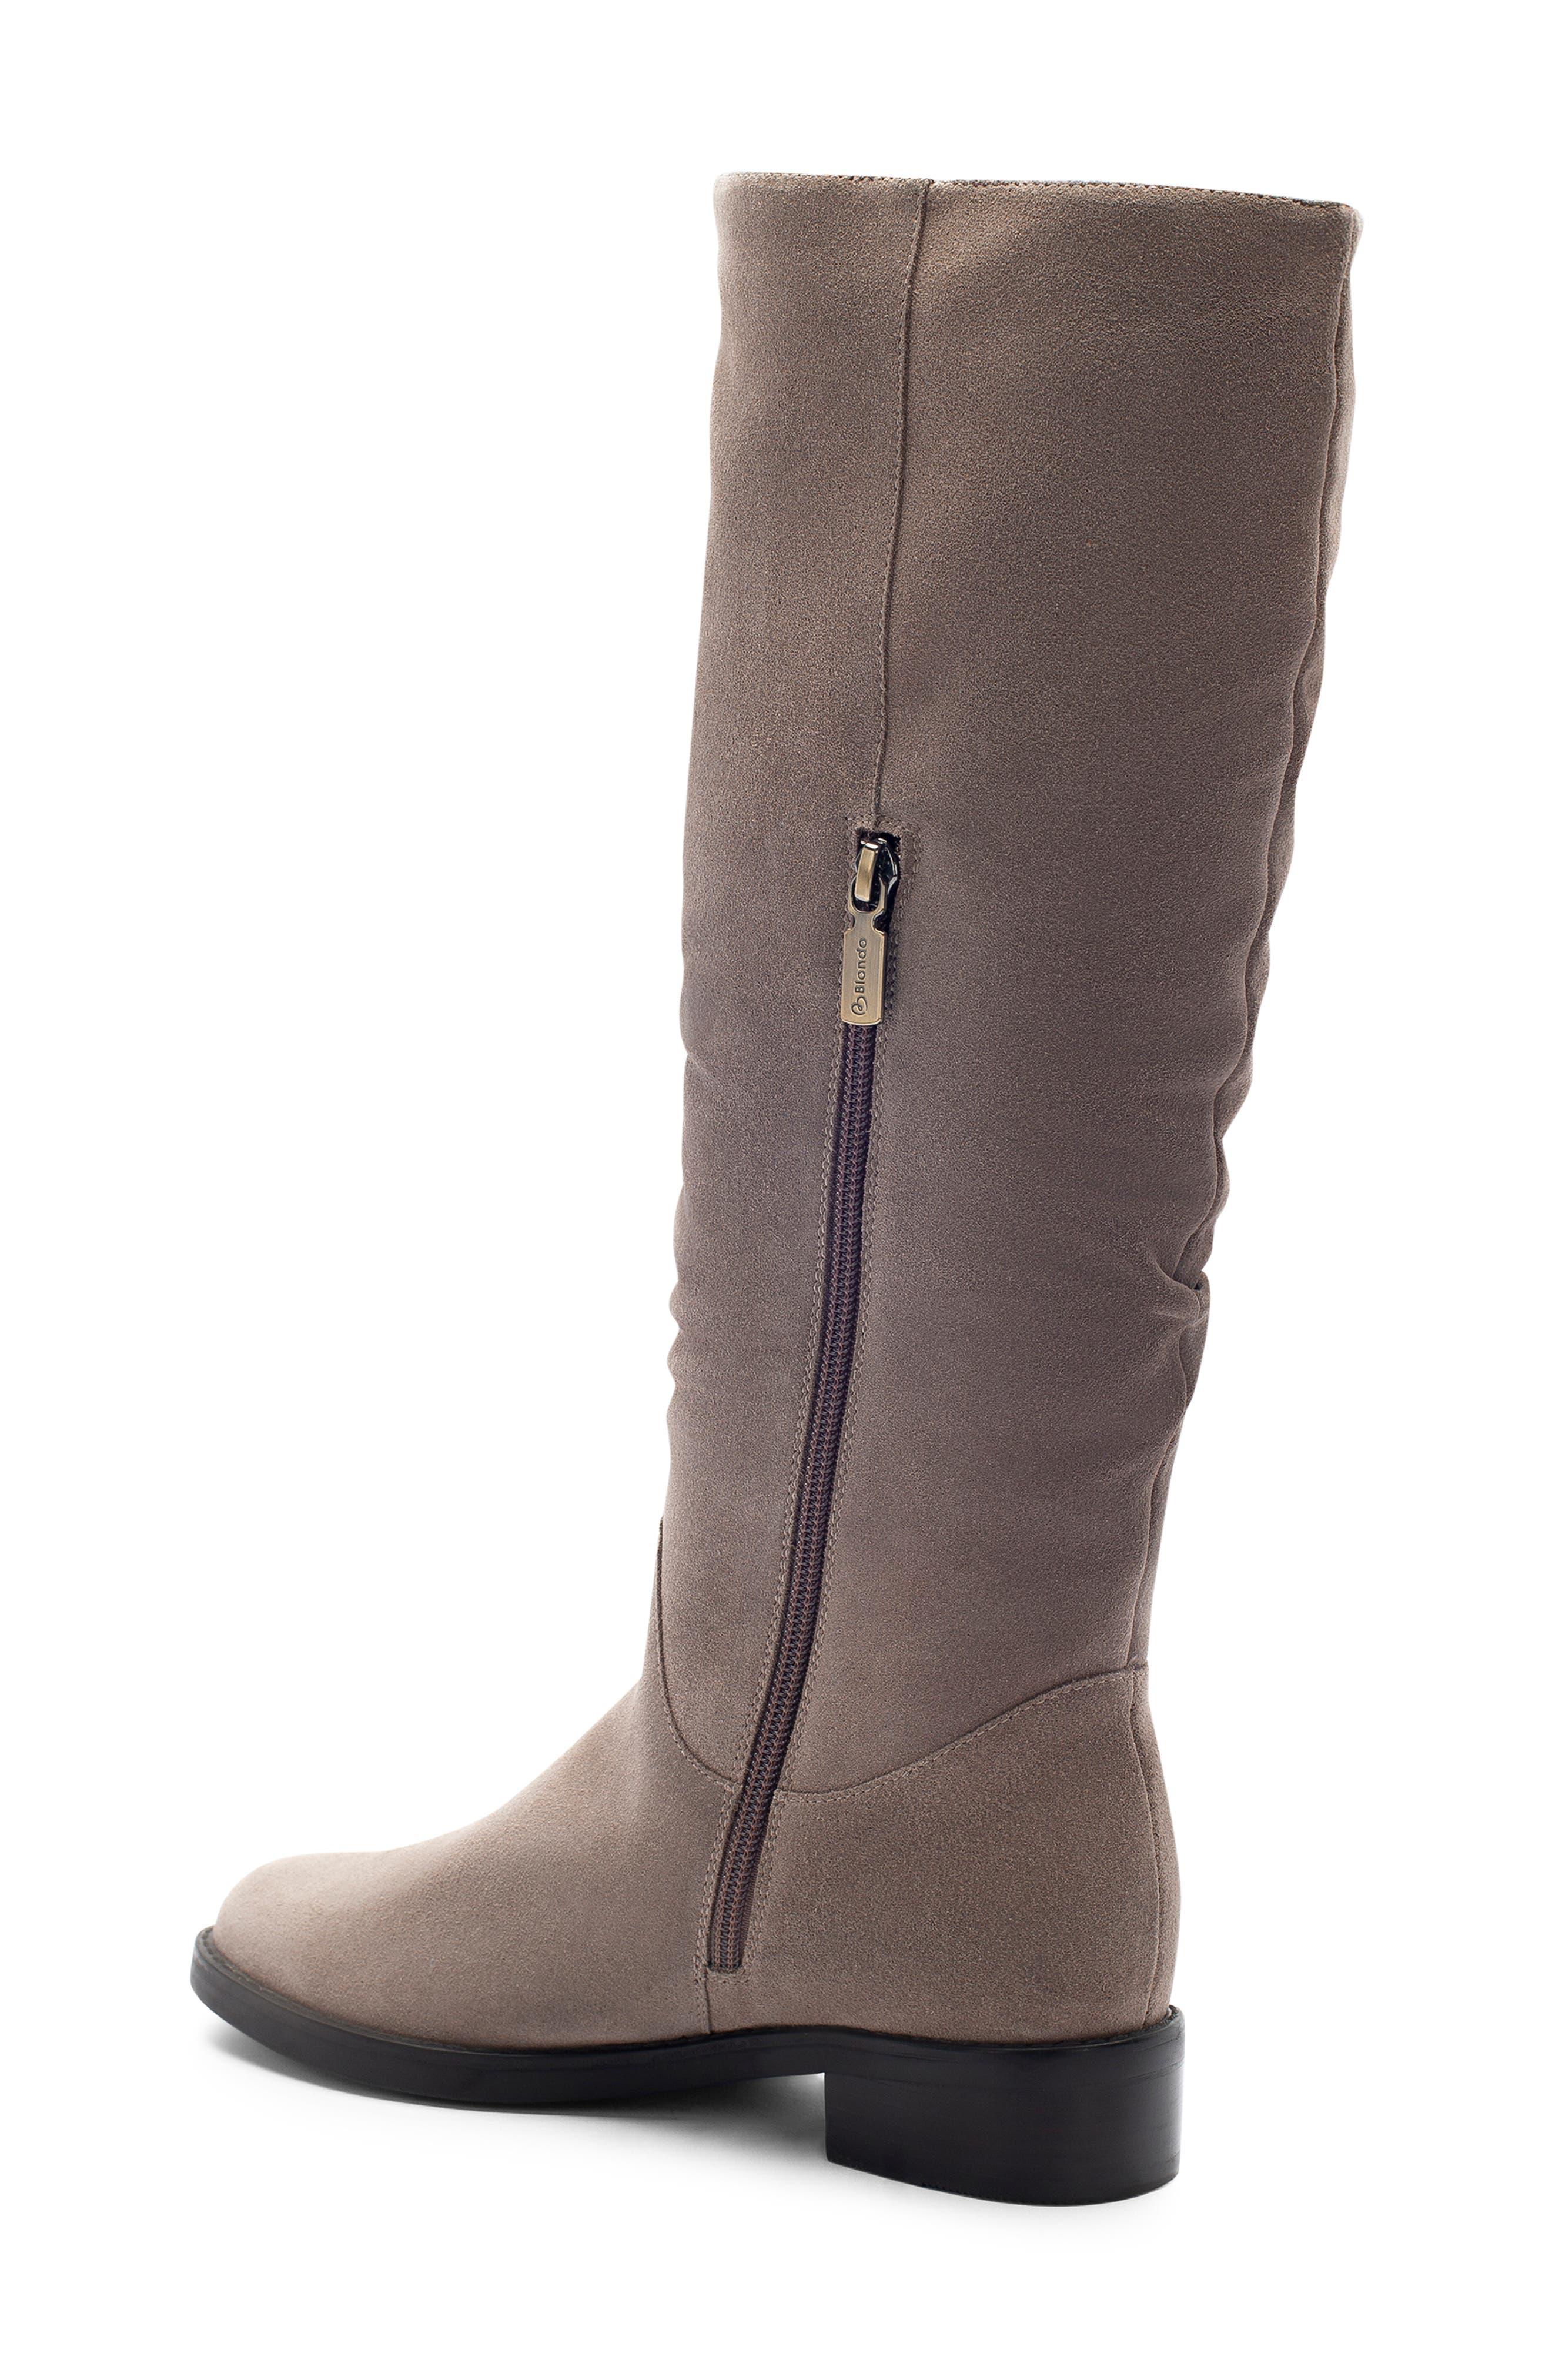 BLONDO, Erika Waterproof Knee High Boot, Alternate thumbnail 2, color, DARK TAUPE SUEDE